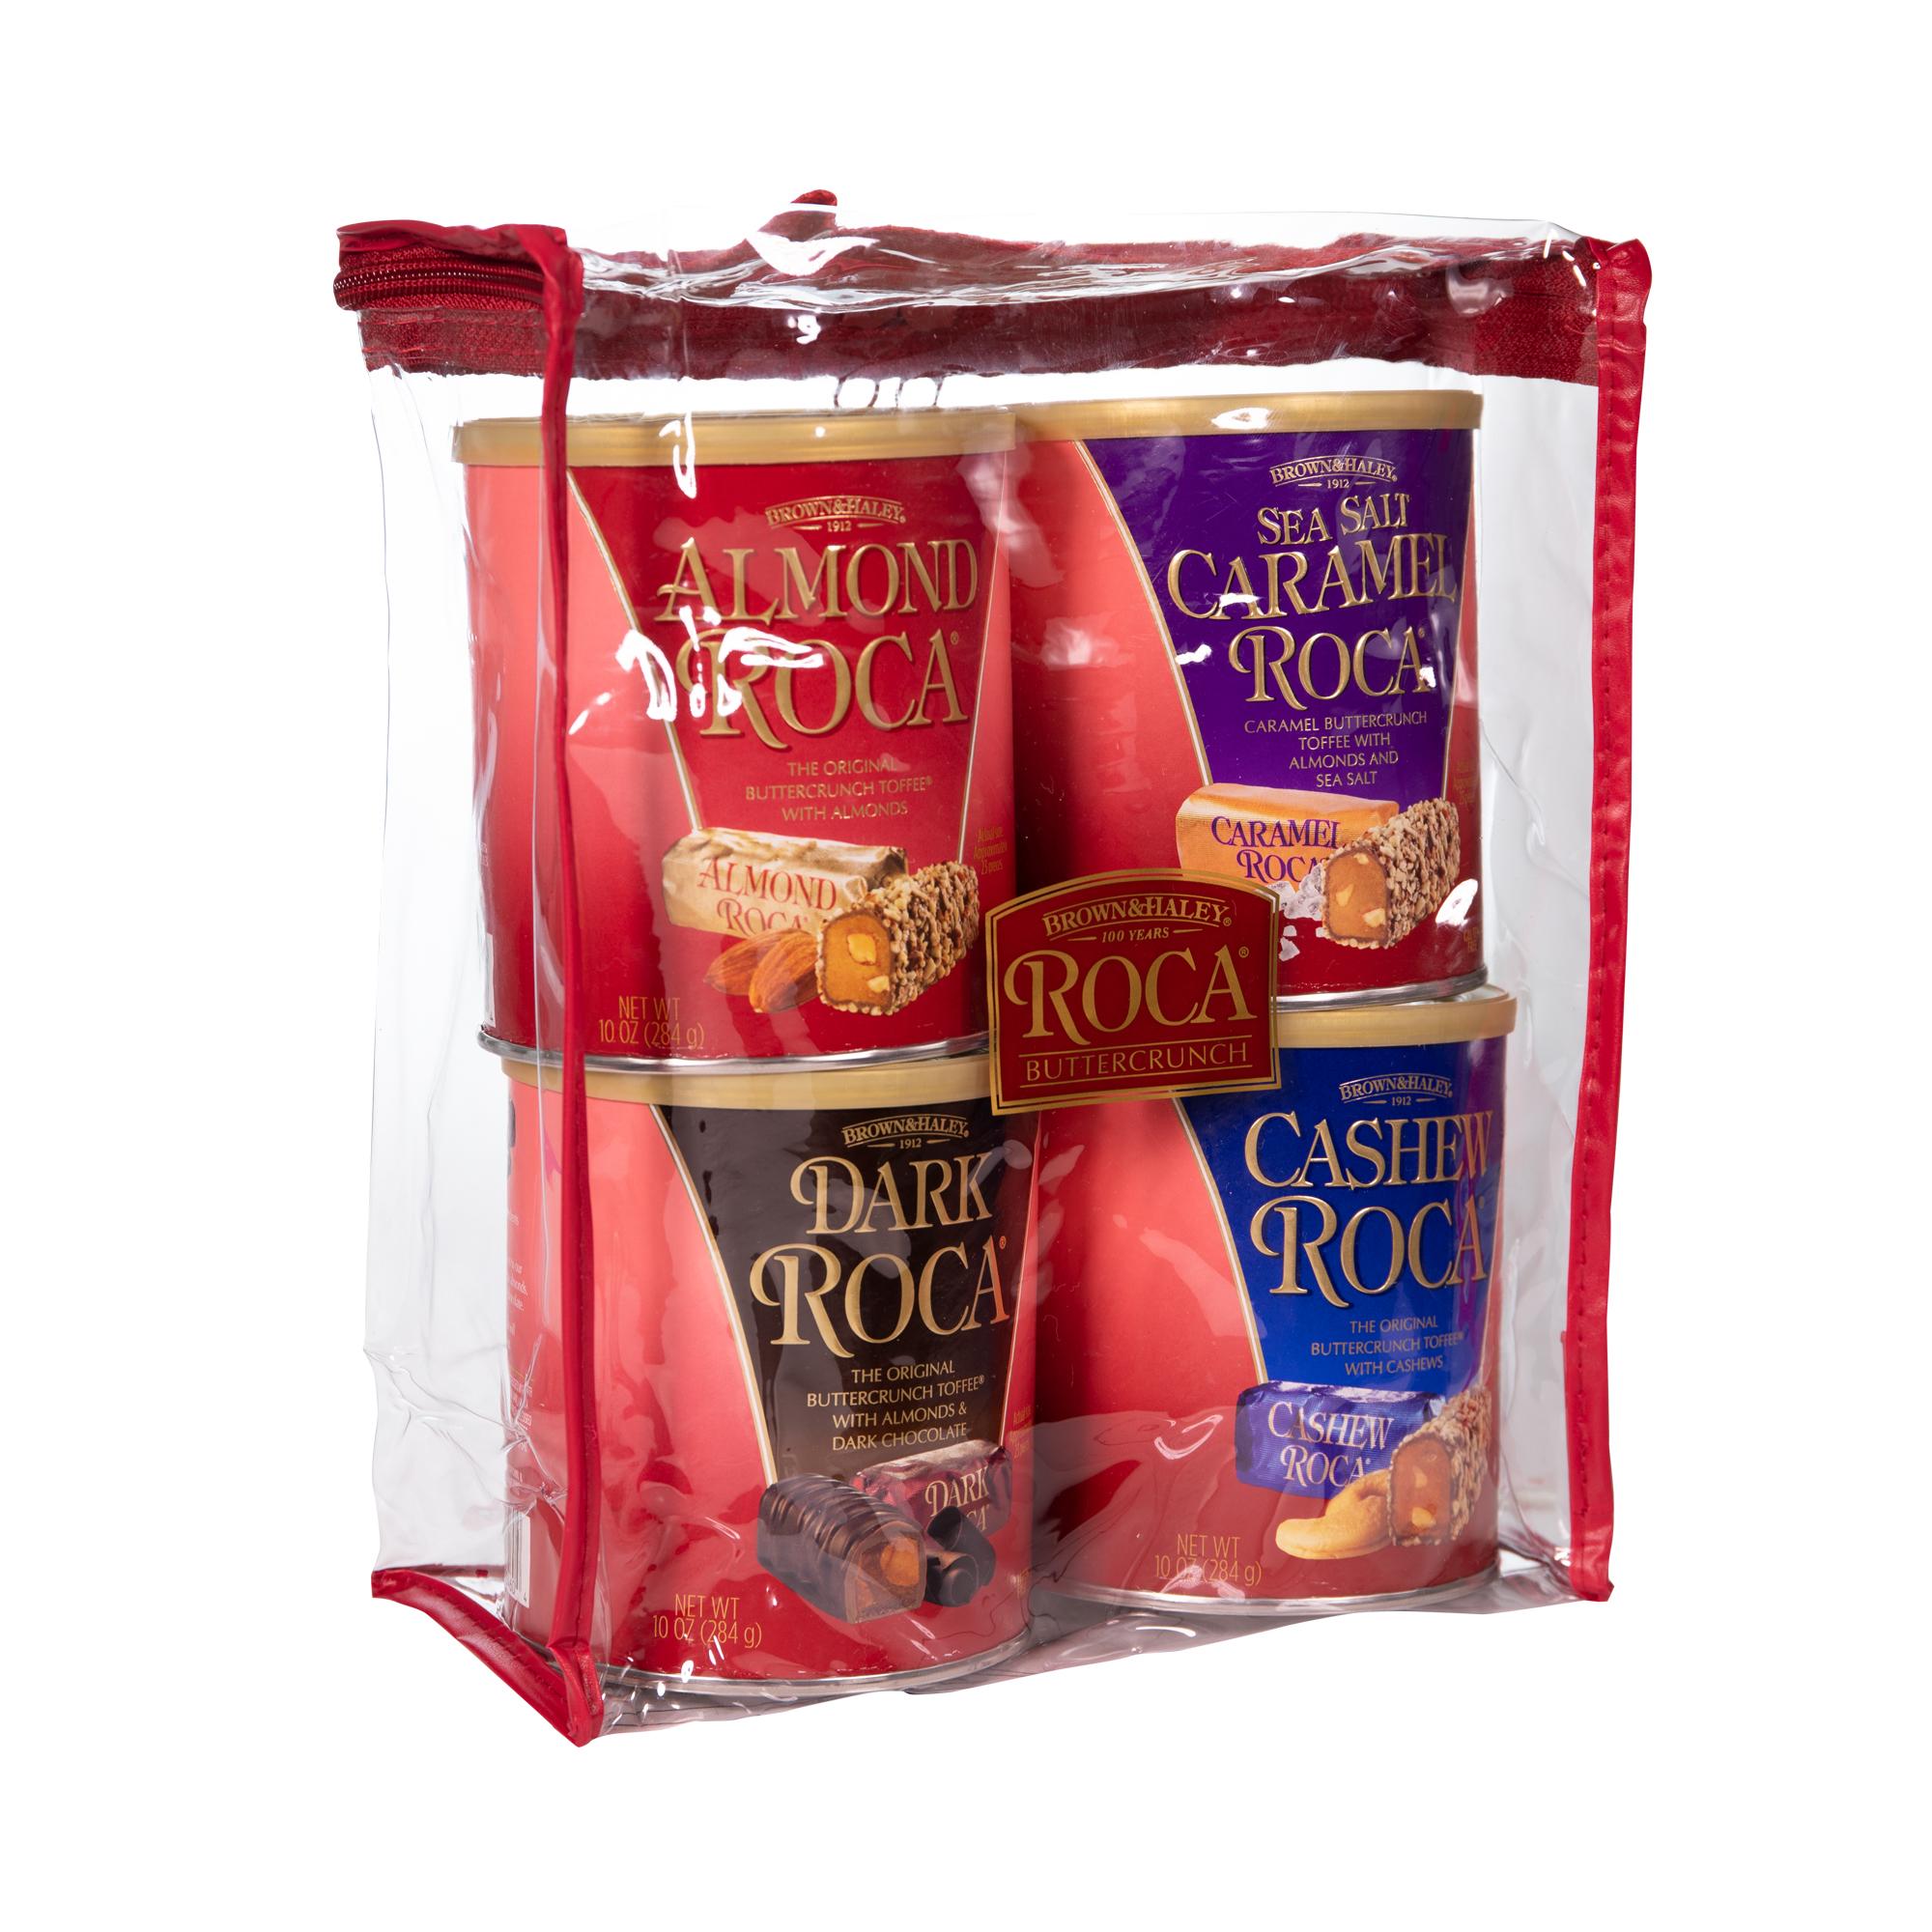 0675 40 oz Four Flavor Tote: ALMOND ROCA®,SEA SALT CARAMEL ROCA®, DARK ROCA®,CASHEW ROCA® - Right-facing View